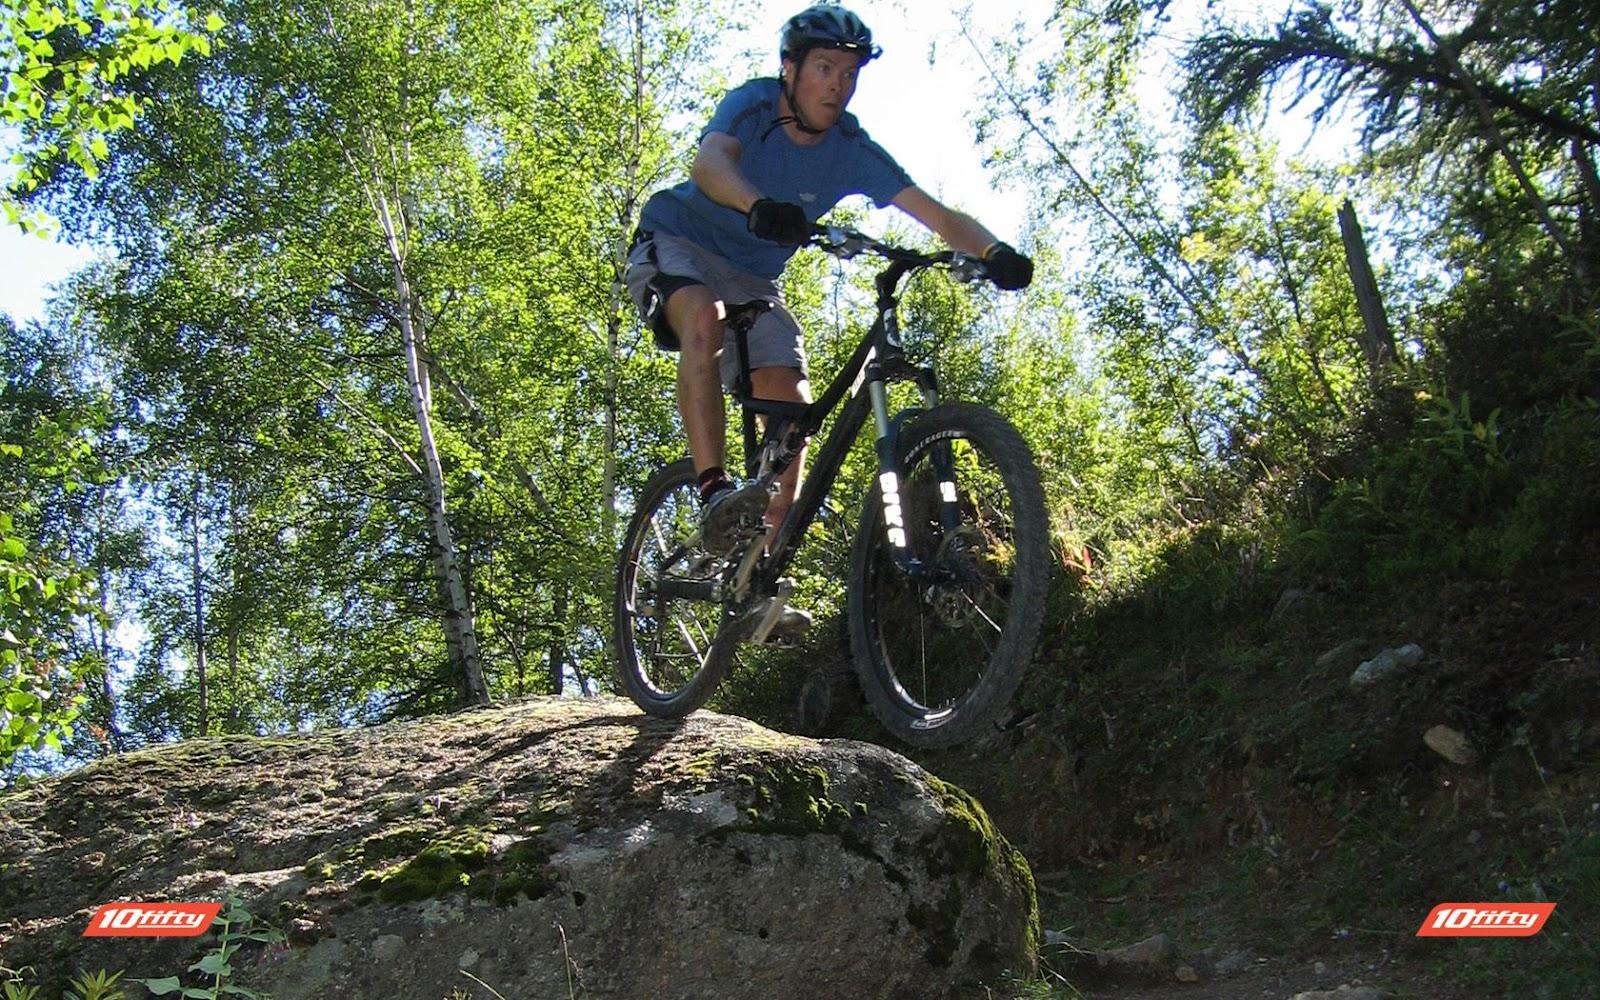 Hd wallpaper mountain - Deportes Extremos